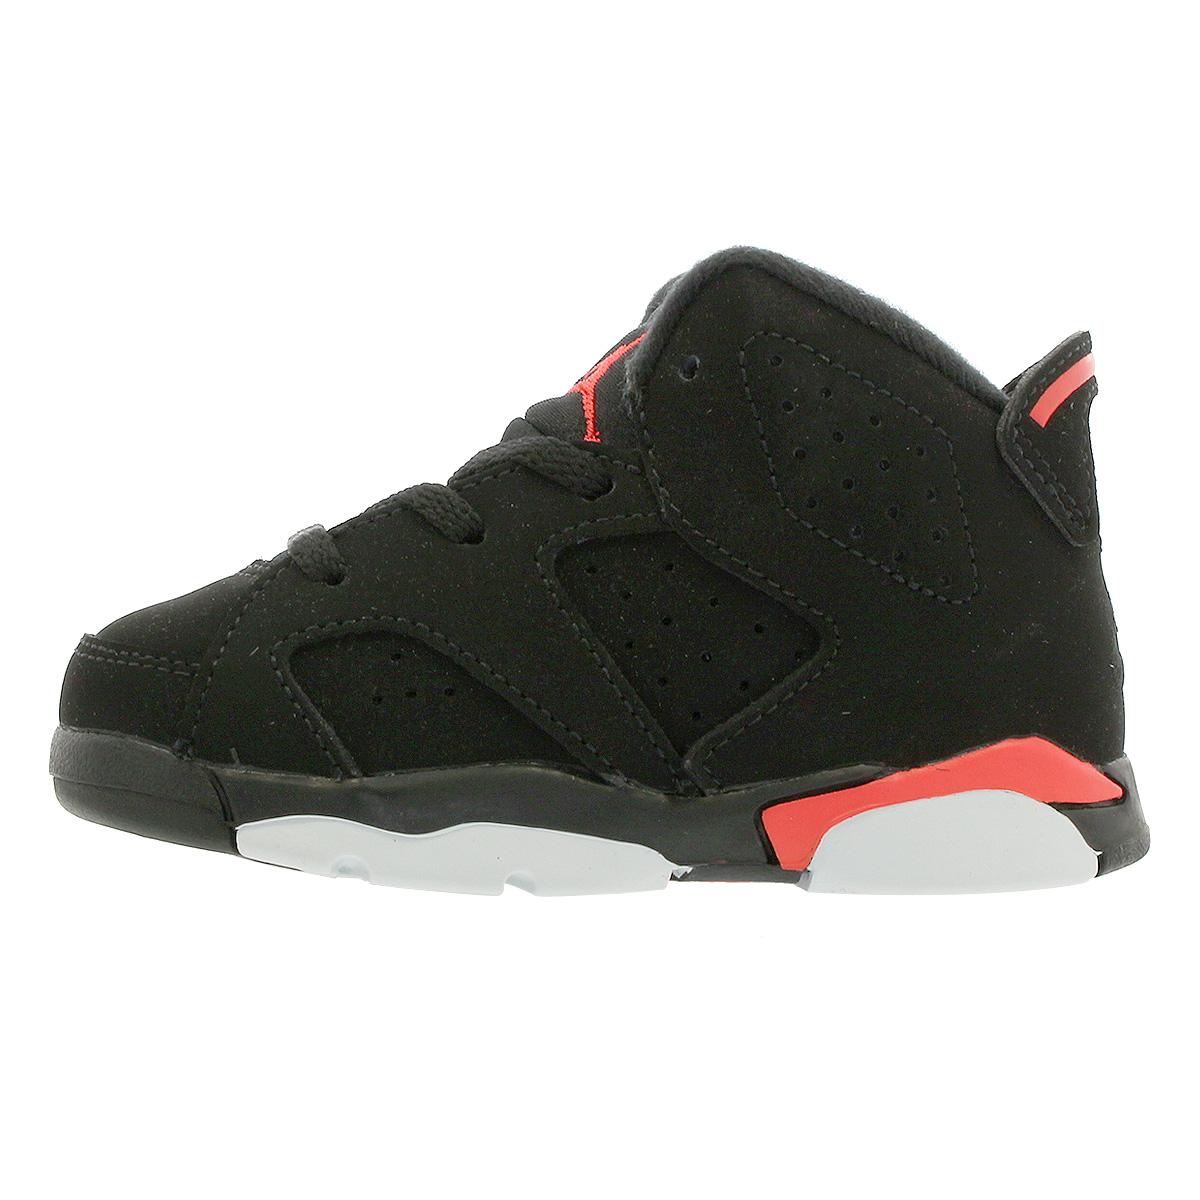 a0aadb269b38ef LOWTEX PLUS  NIKE AIR JORDAN 6 RETRO BT Nike Air Jordan 6 nostalgic BT BLACK  INFRARED 384